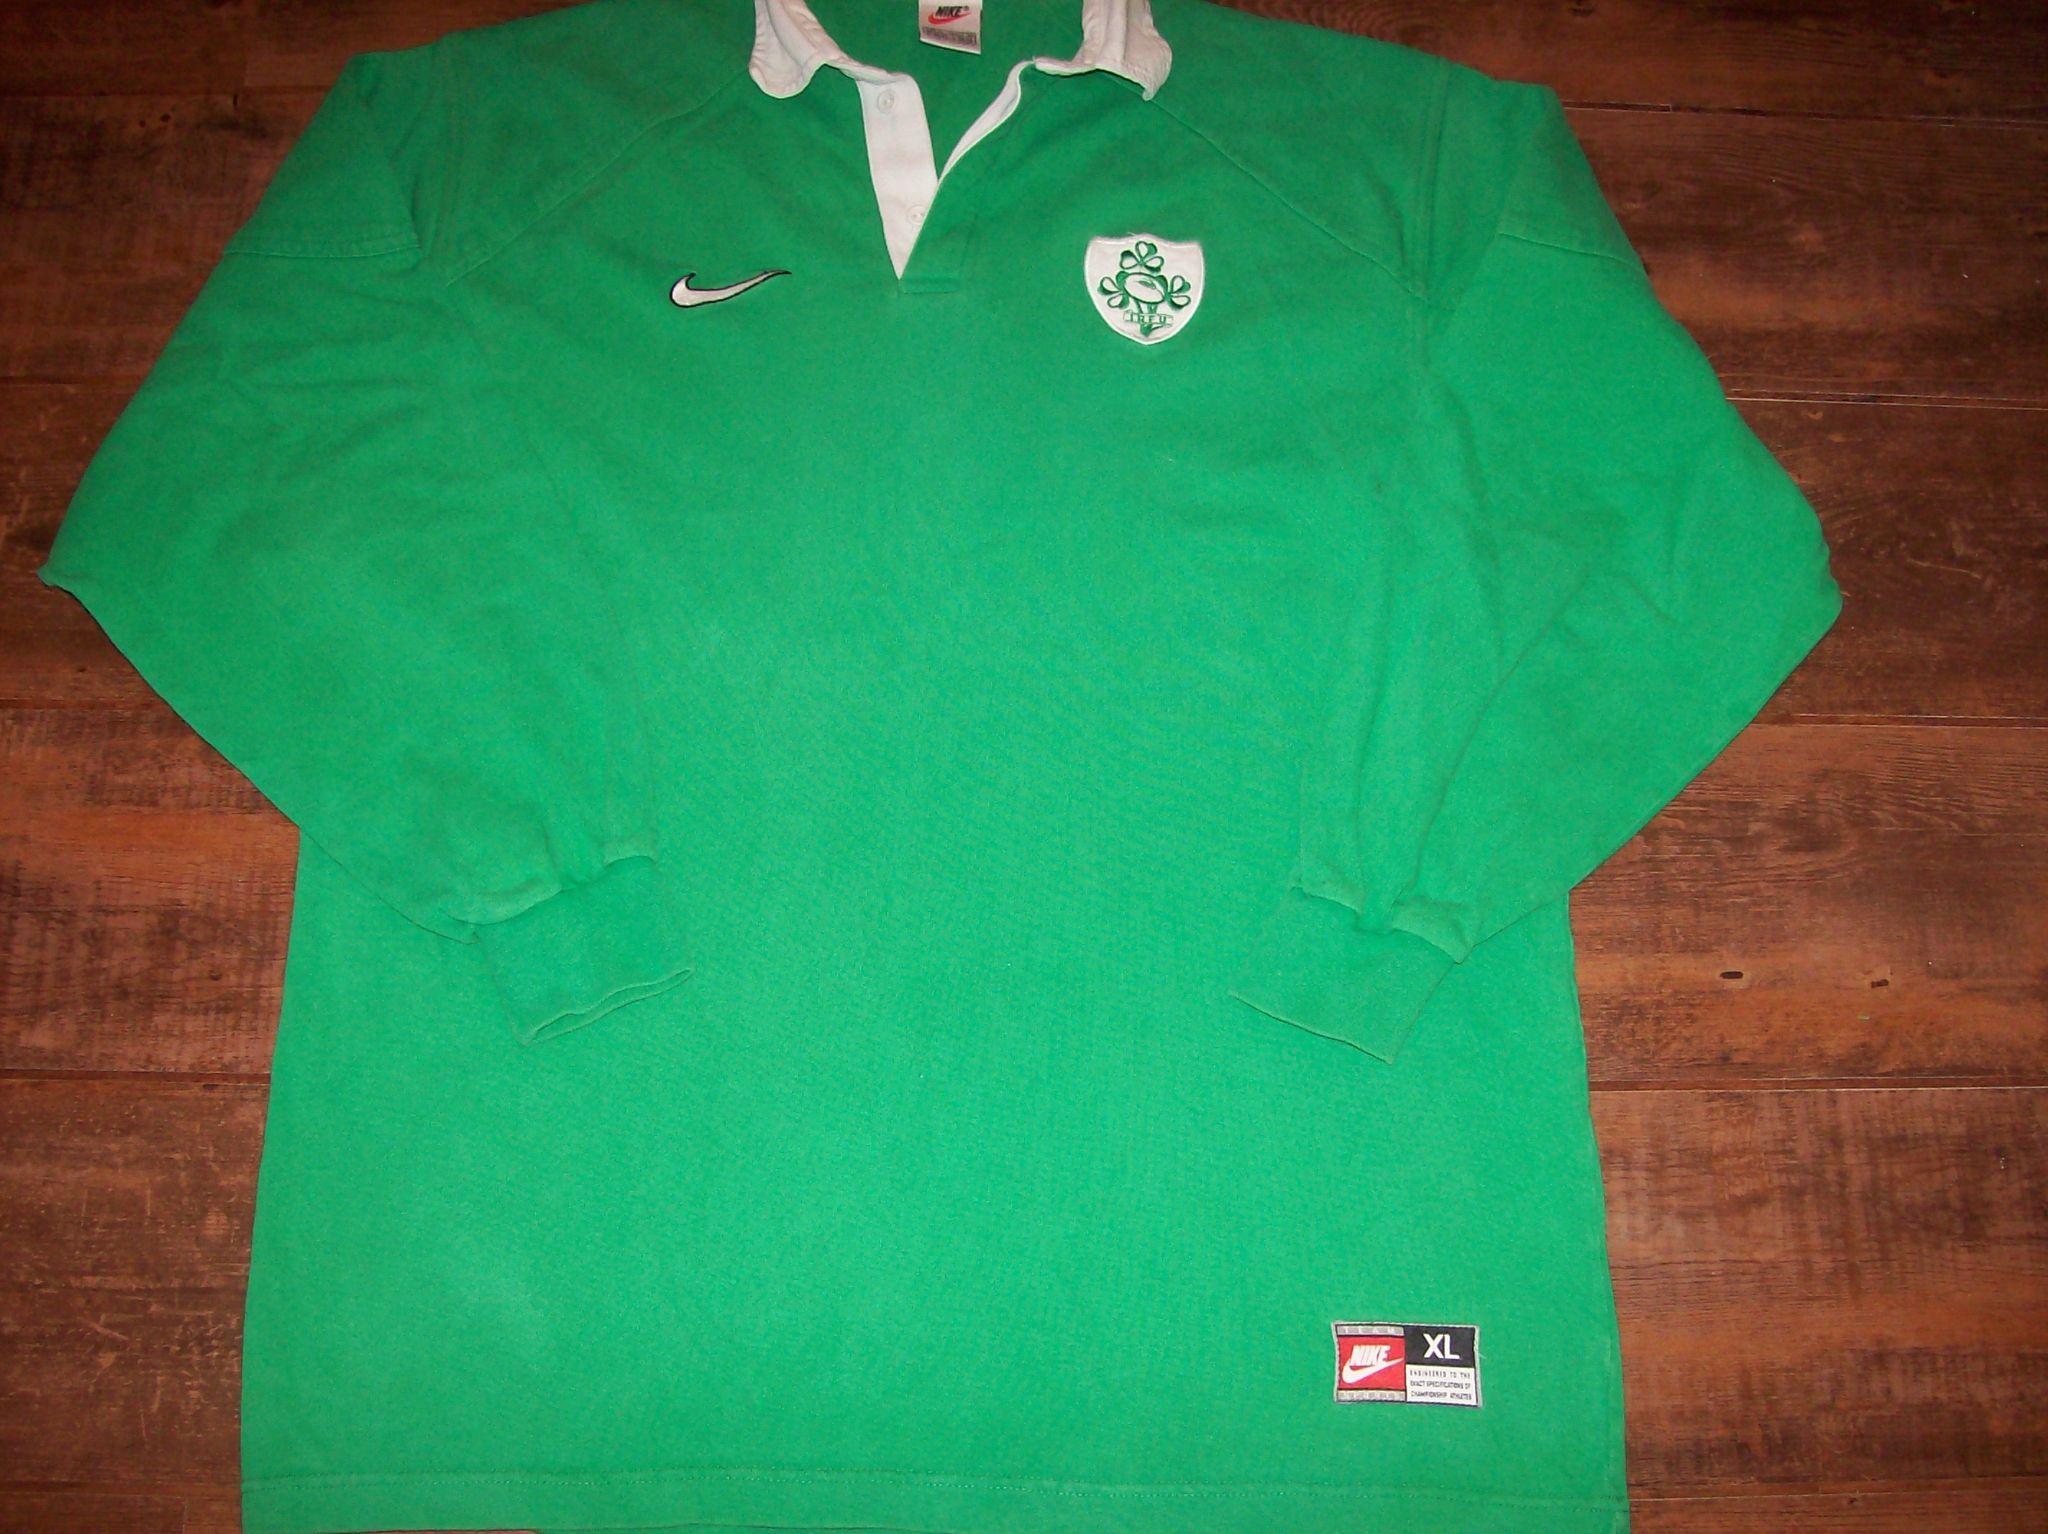 1998 1999 Ireland Rugby Union Shirt Adults XL Jersey